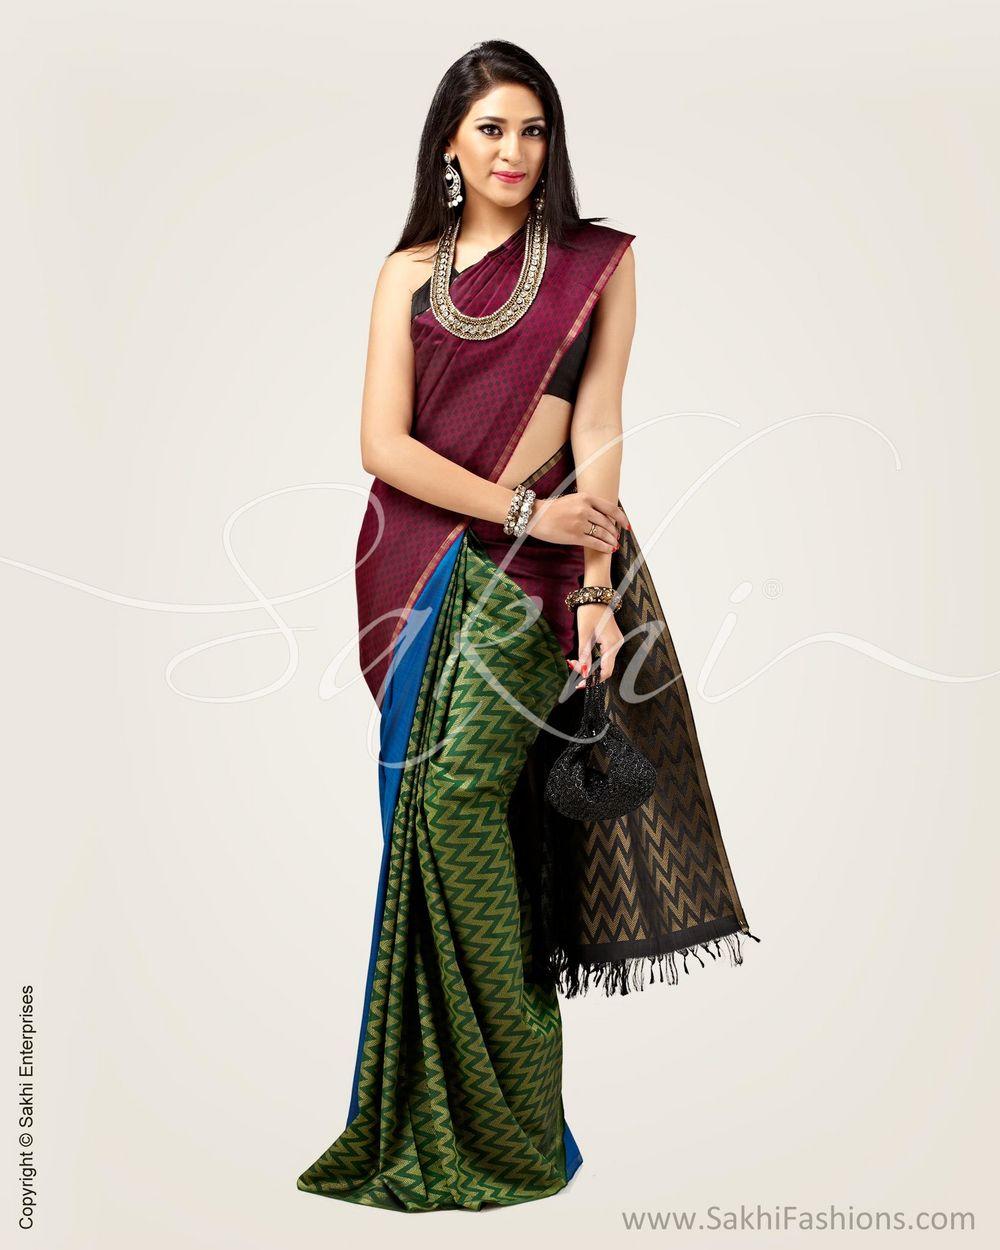 Photo From Designer Sarees - By Sakhi Fashions